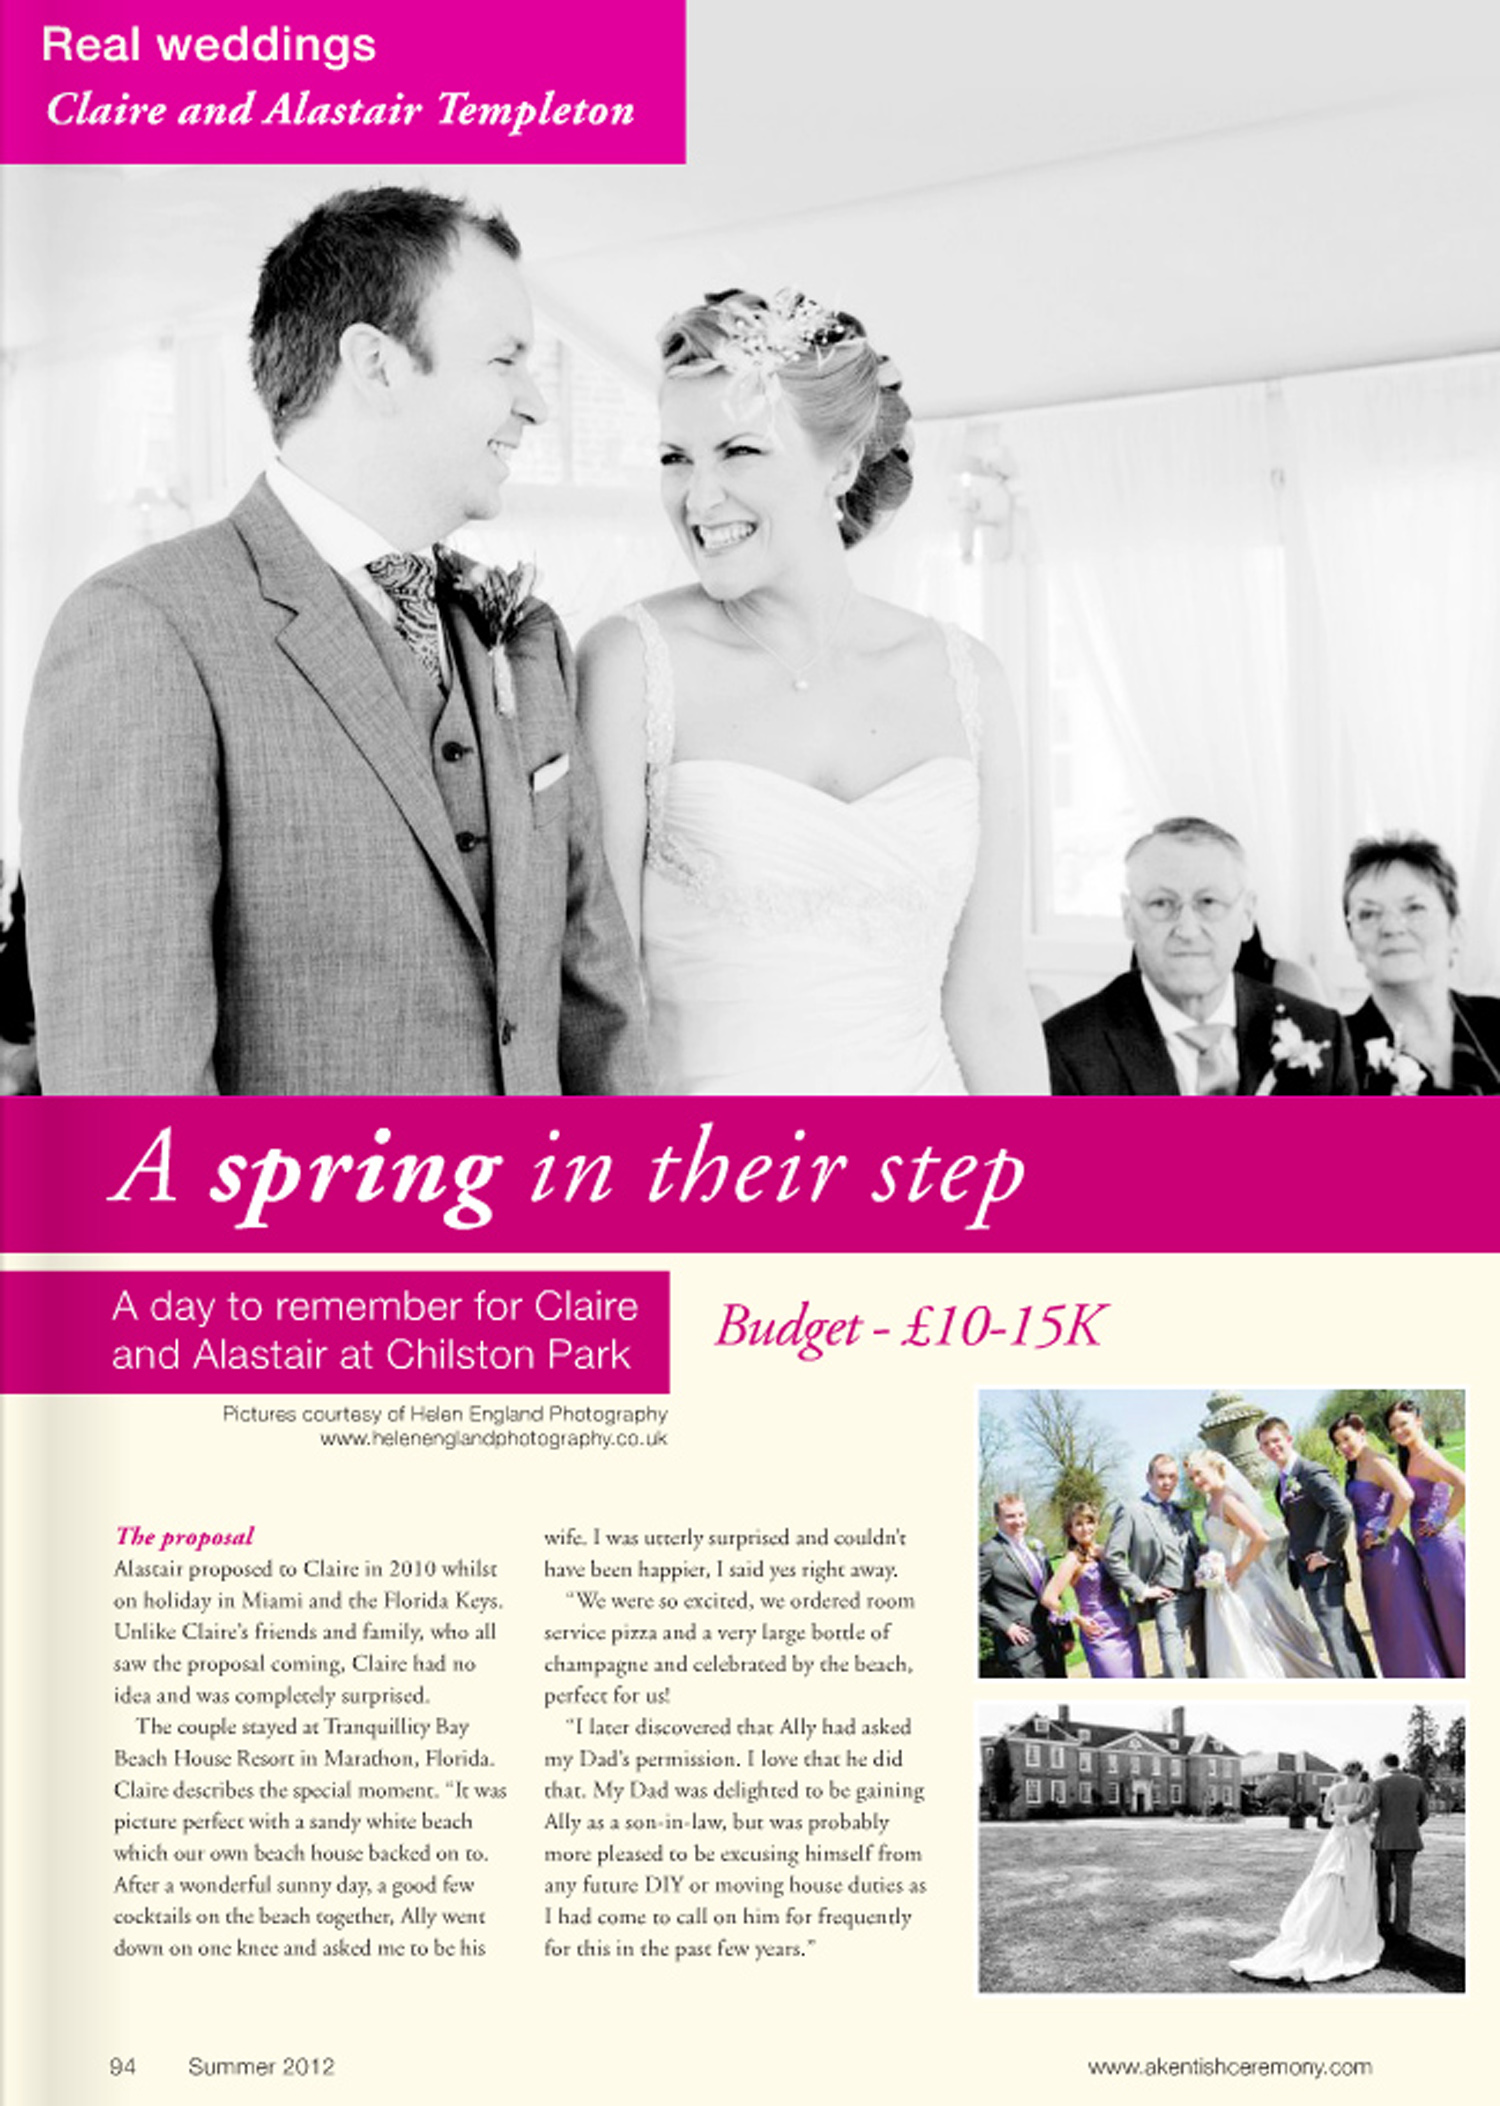 Summer 2012 page 94.jpg